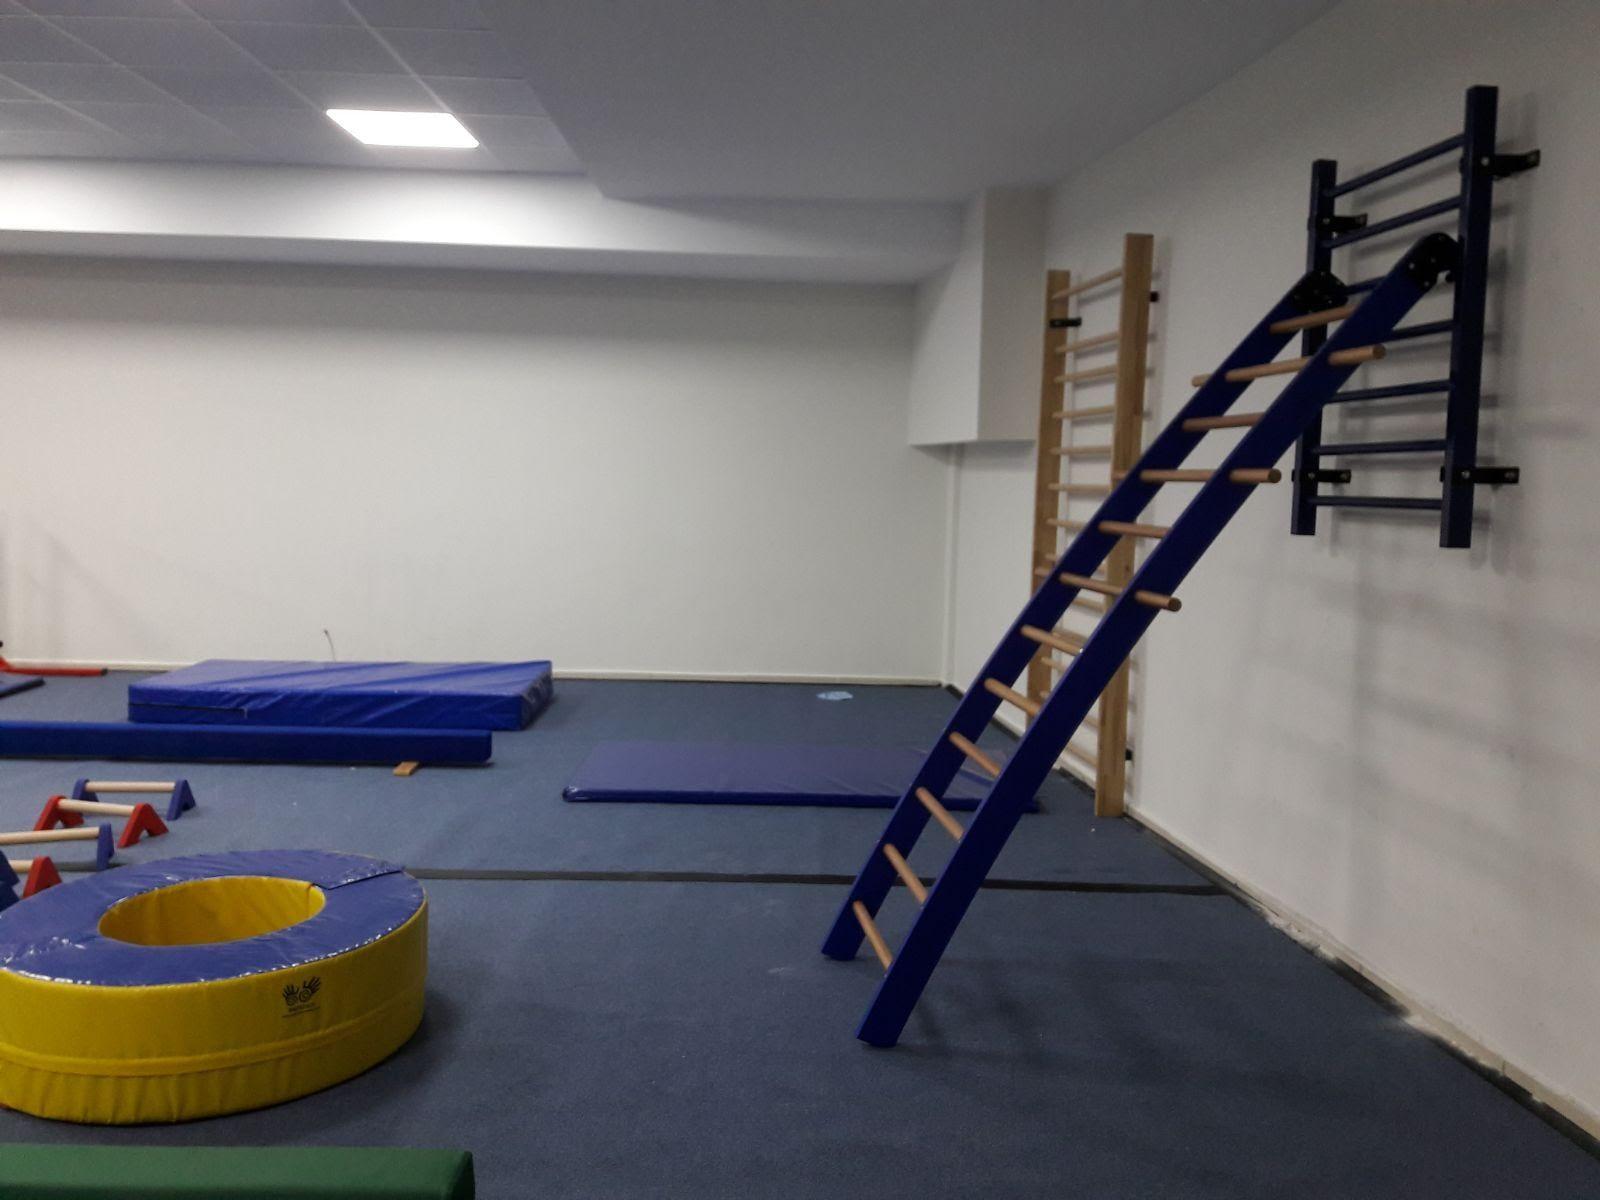 Gymnastic Cimnastik Malzemeleri Cimnastik Malzemeleri Cimnastik Malzemeleri Asimetrik Paralel Cimnastik Malzemeleri Cimlastik Mal Taekwondo Jimnastik